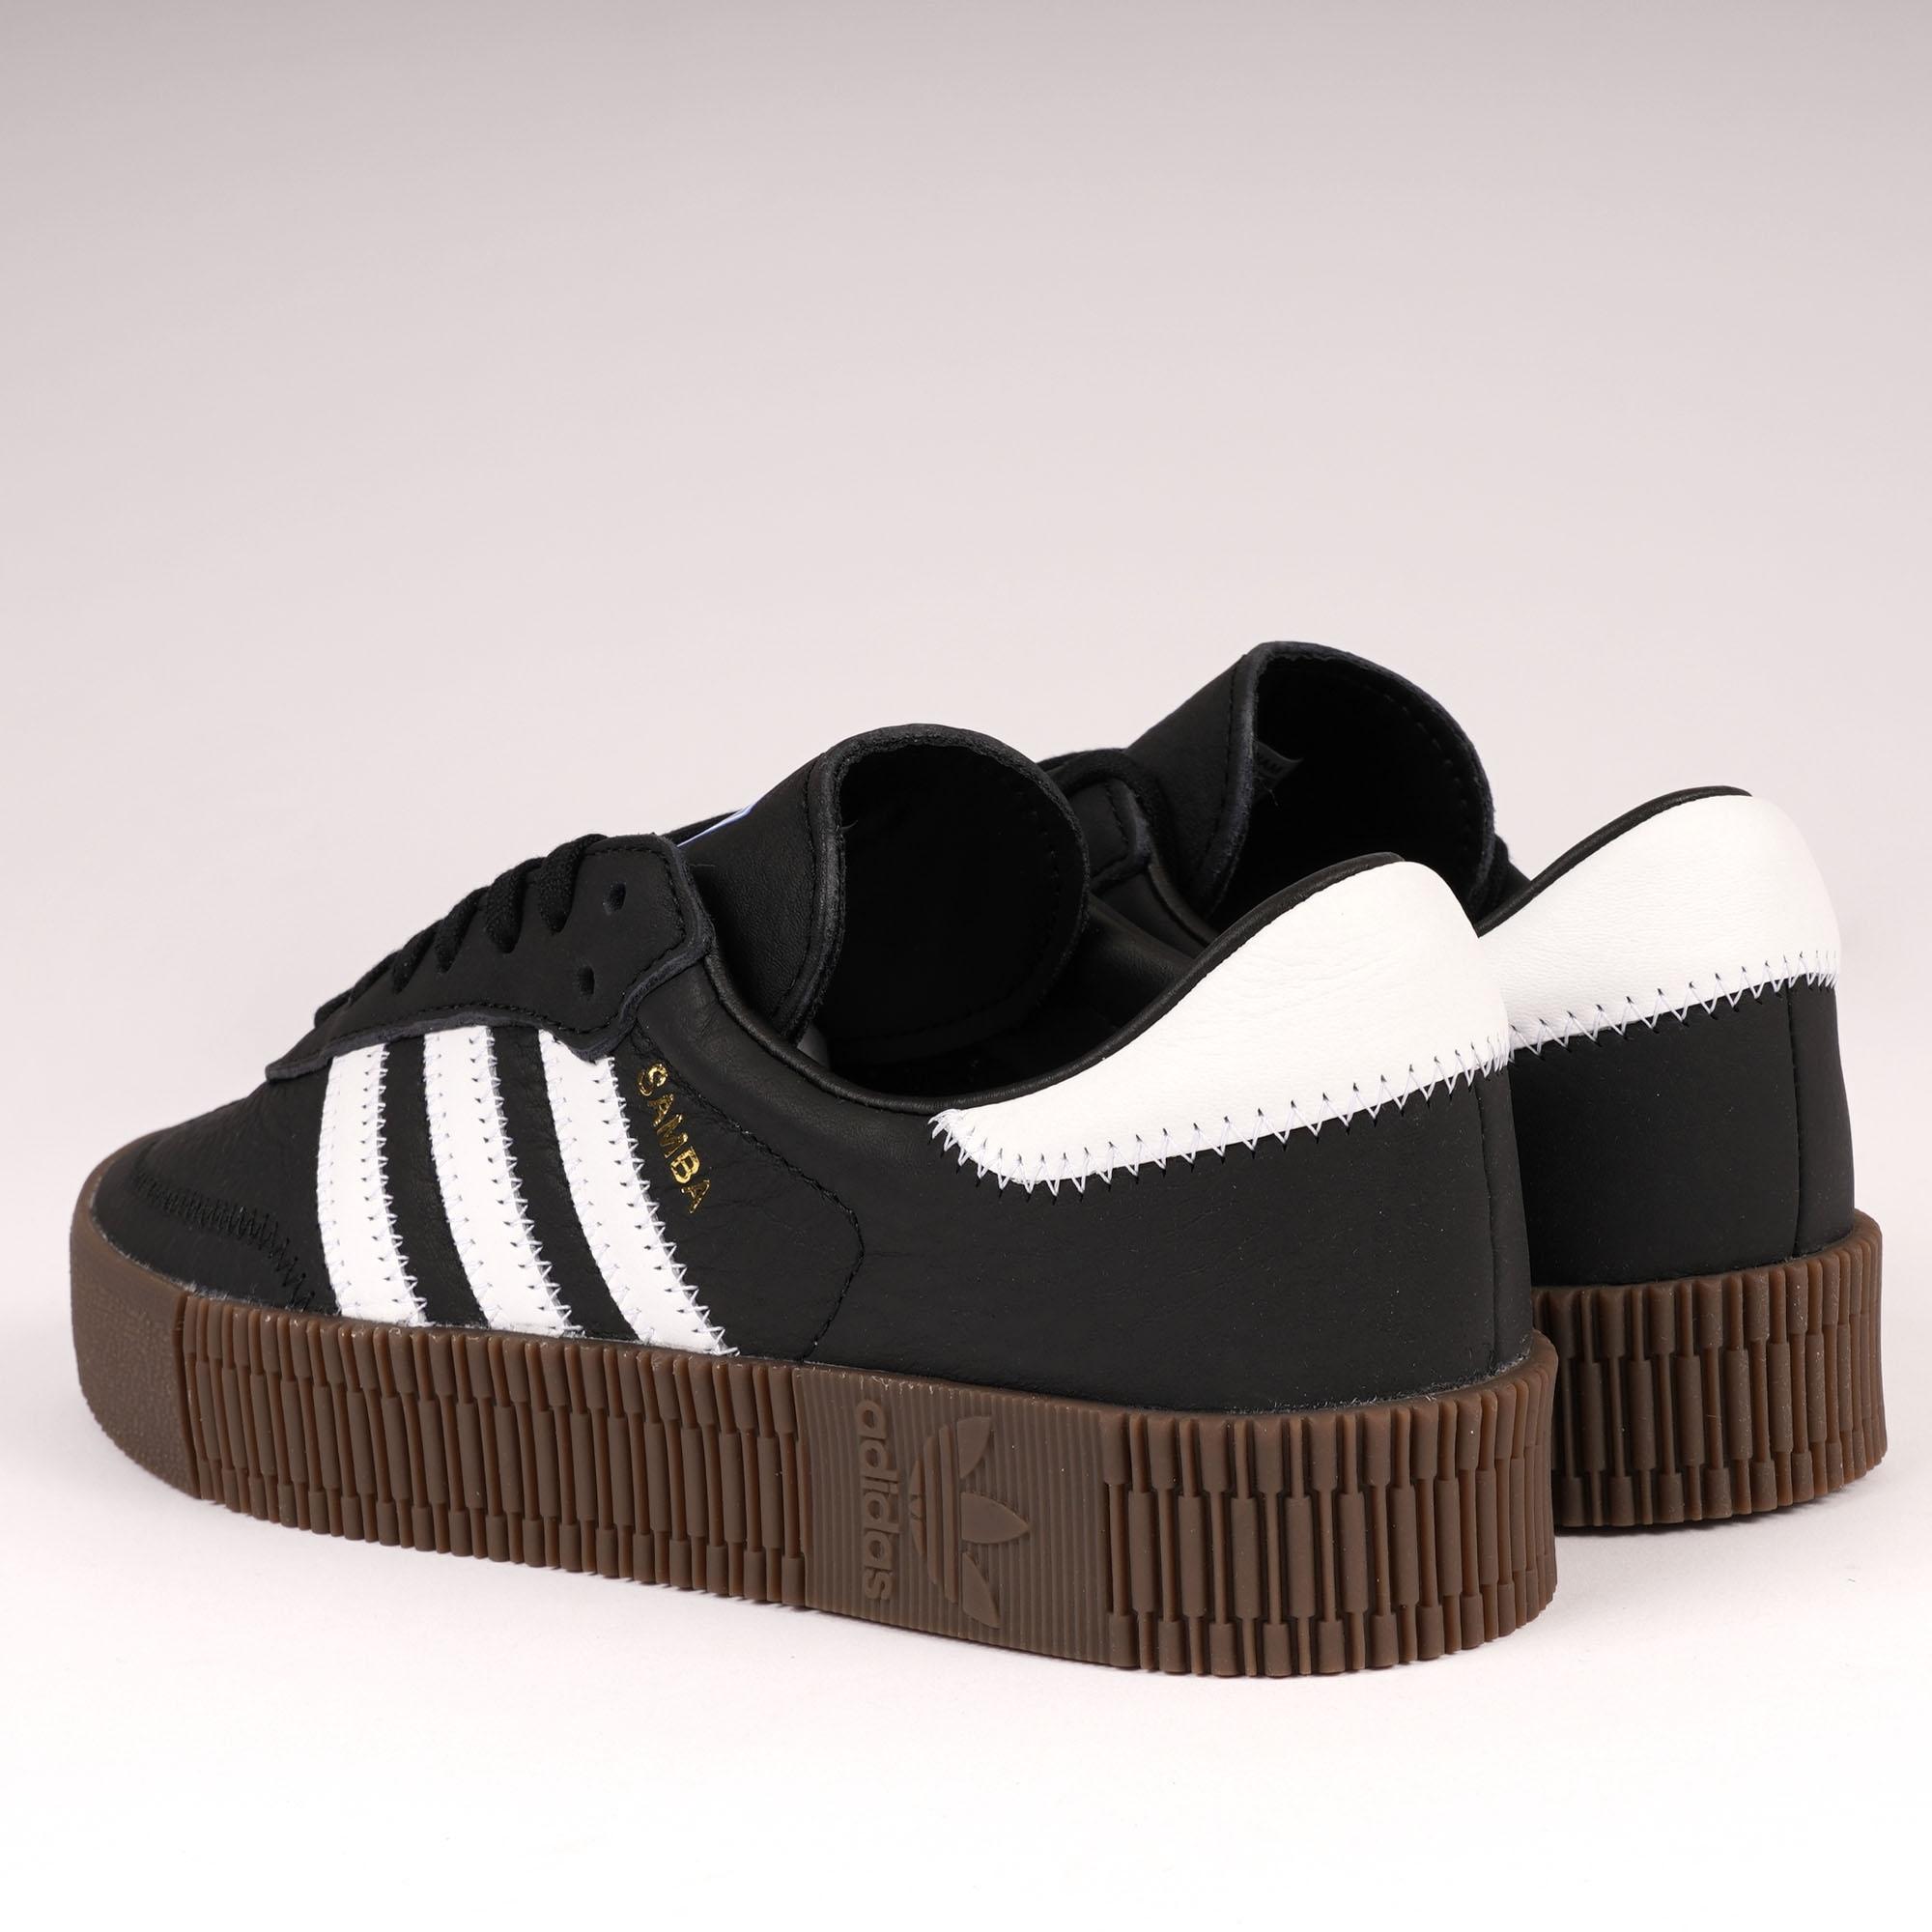 cda5537aa99 adidas Originals Womens Sambarose